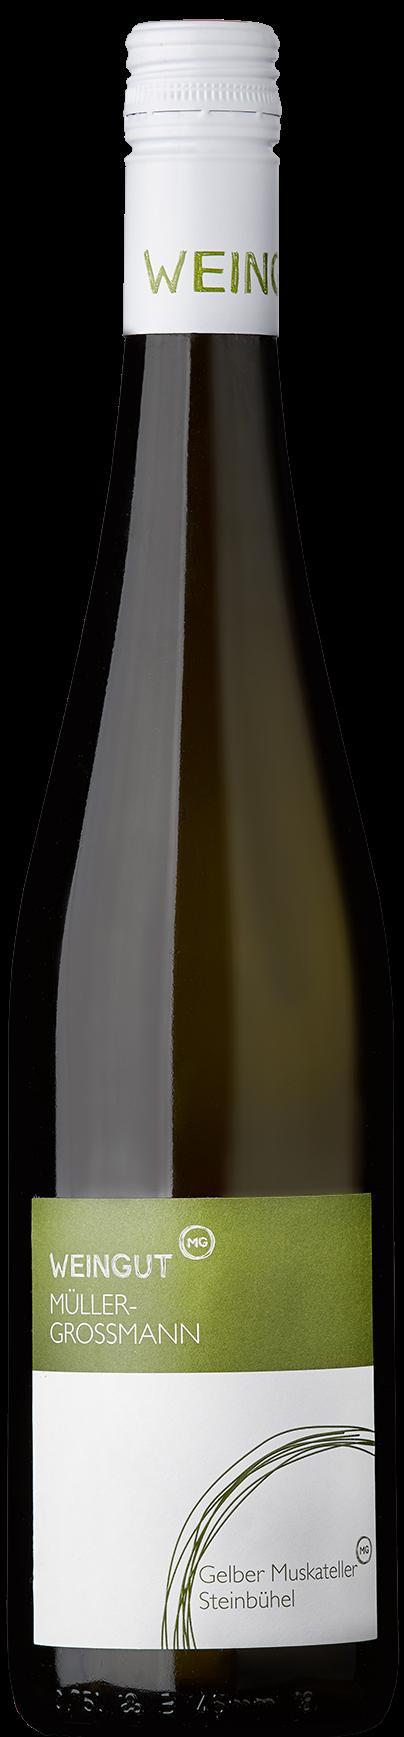 Gelber Muskateller – Steinbühl (2)